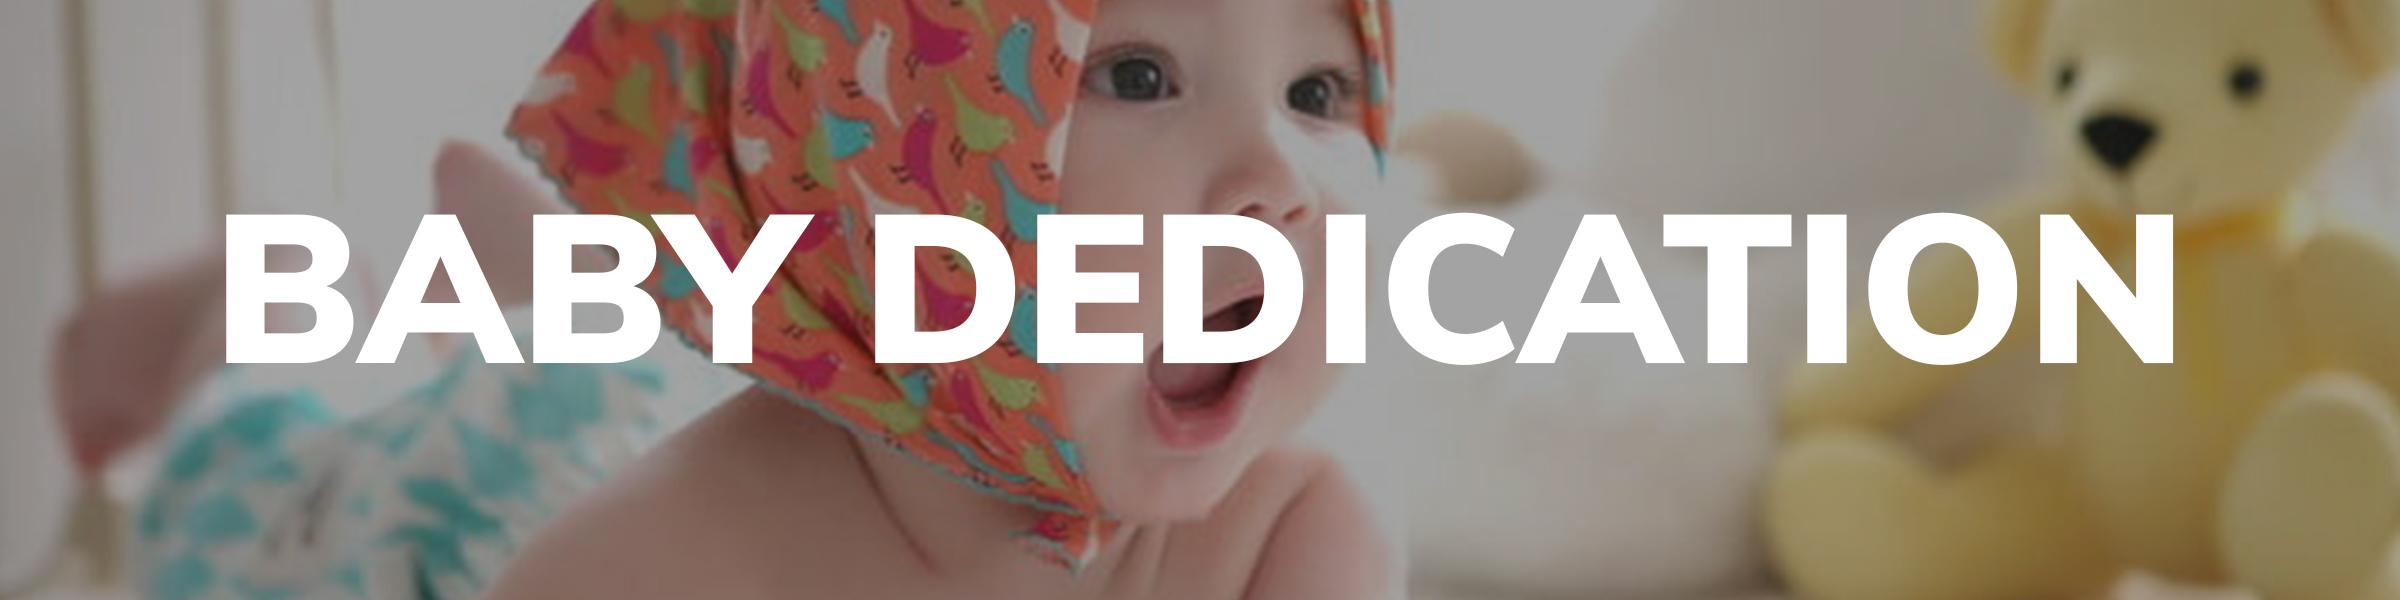 BABY-DEDICATION-PROVSAC.jpg